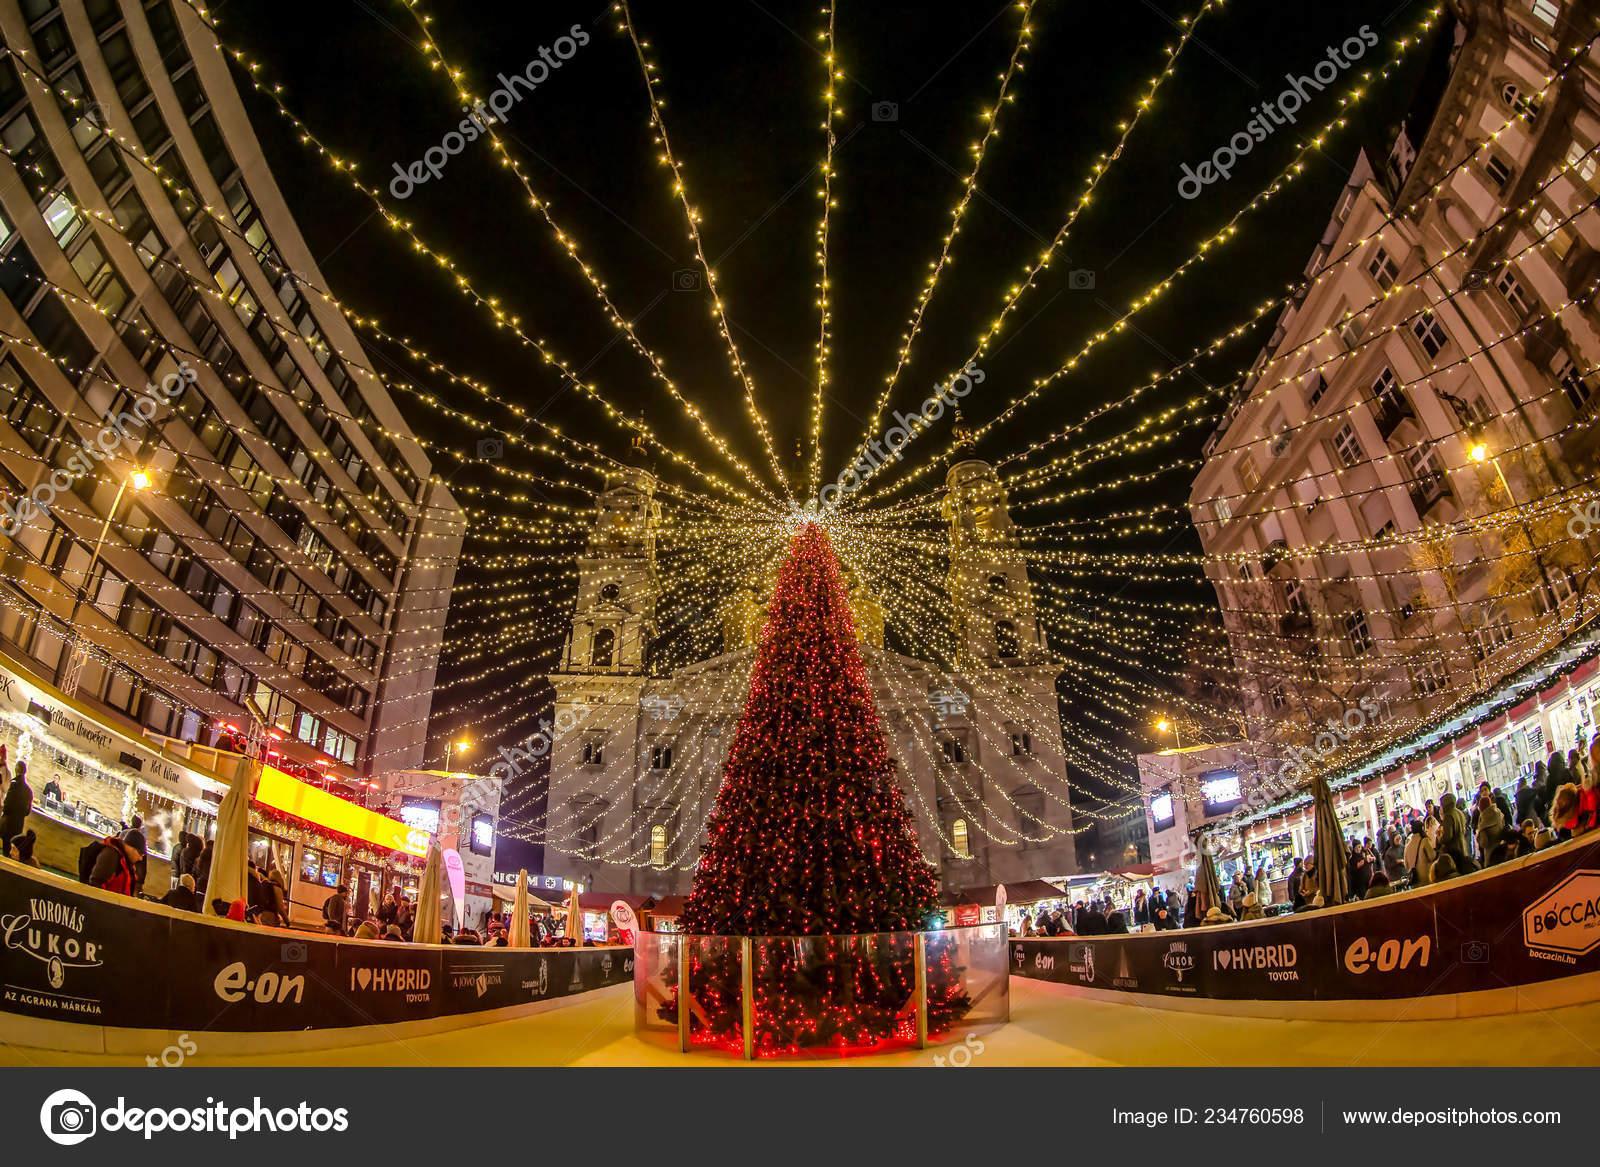 Budapest Christmas Market 2018.Budapest Hungary December 2018 Christmas Market Advent Feast